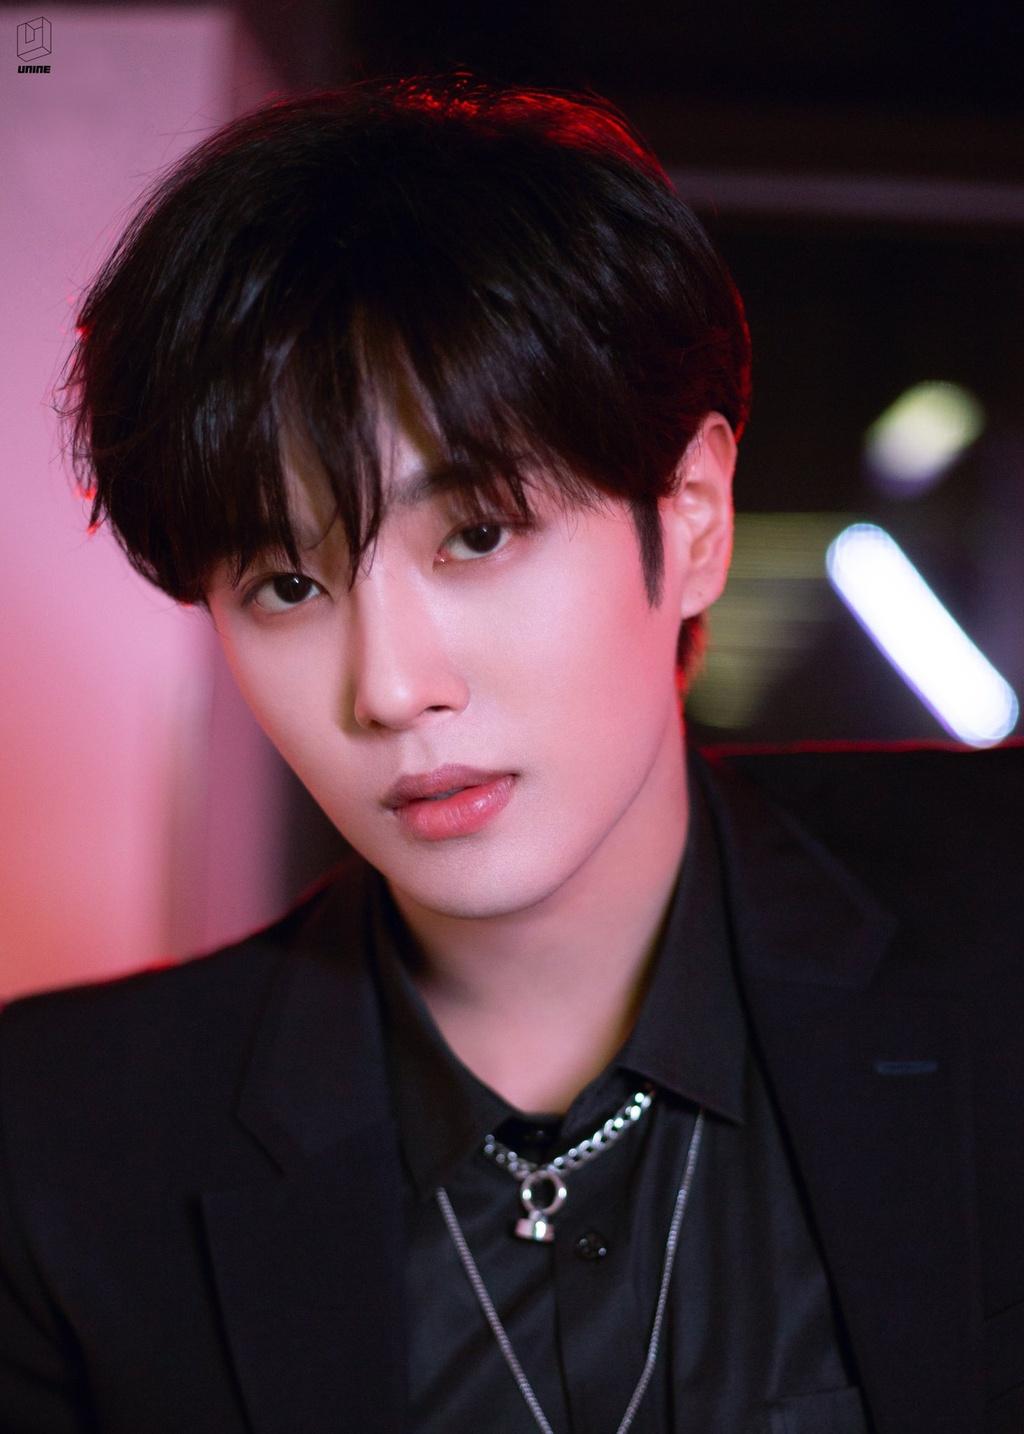 idol Kpop noi tieng sau khi tham gia show song con tai Trung Quoc anh 9